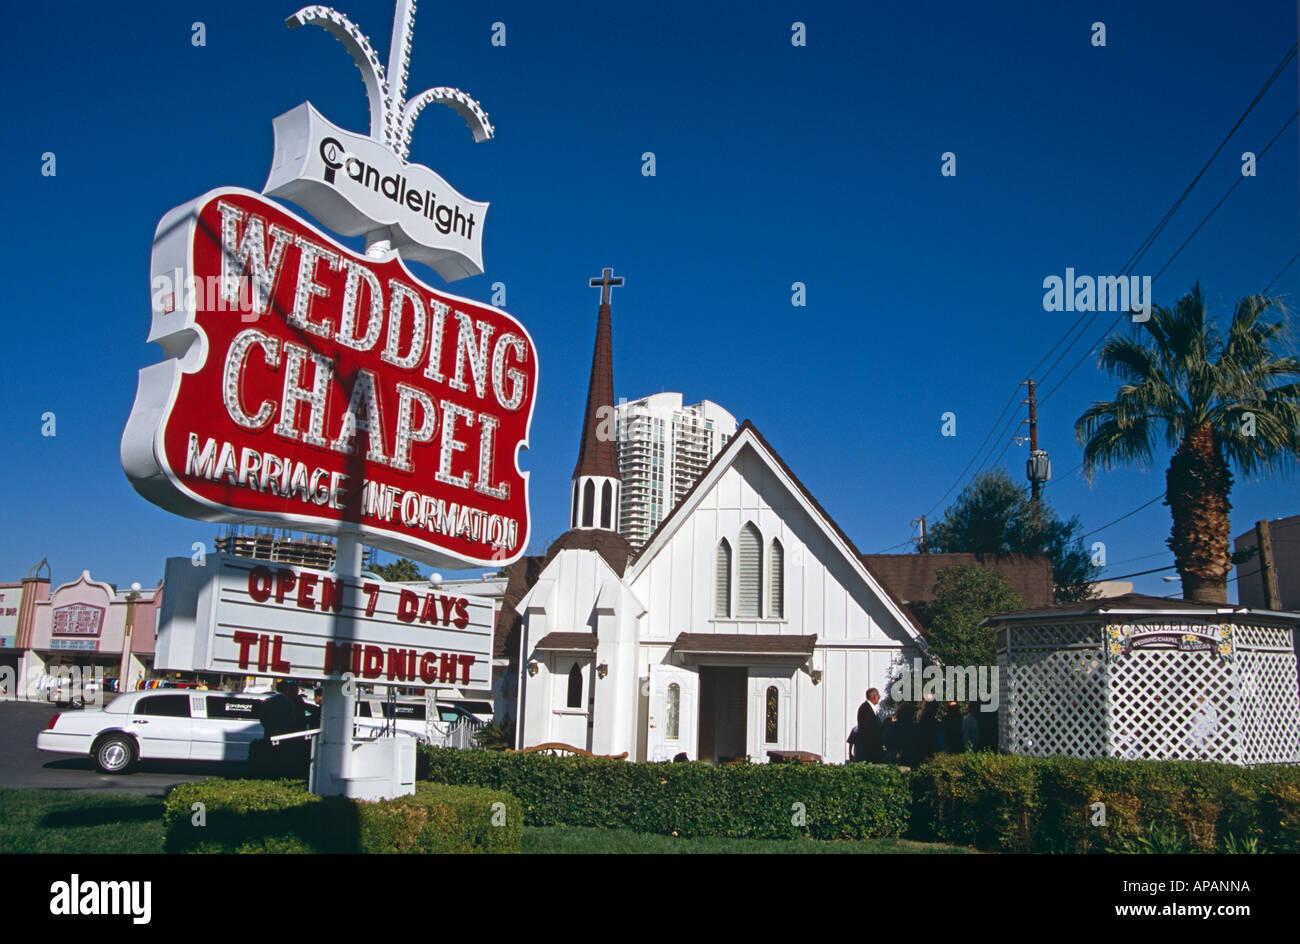 Candlelight Wedding Chapel Las Vegas Nevada Usa Stock